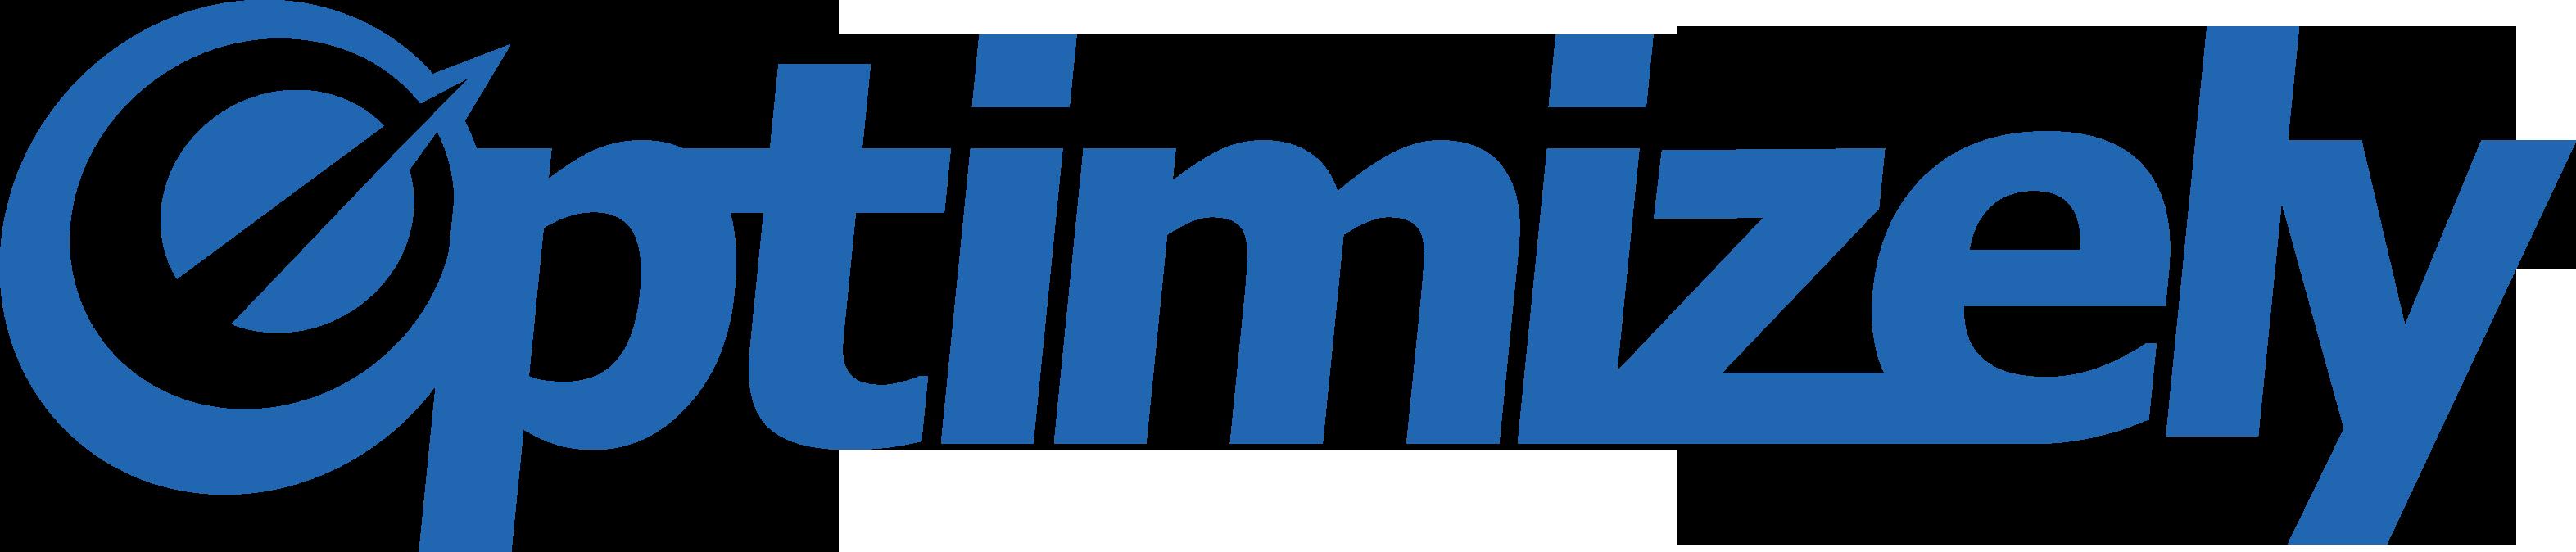 Optimizely blue logo.png.